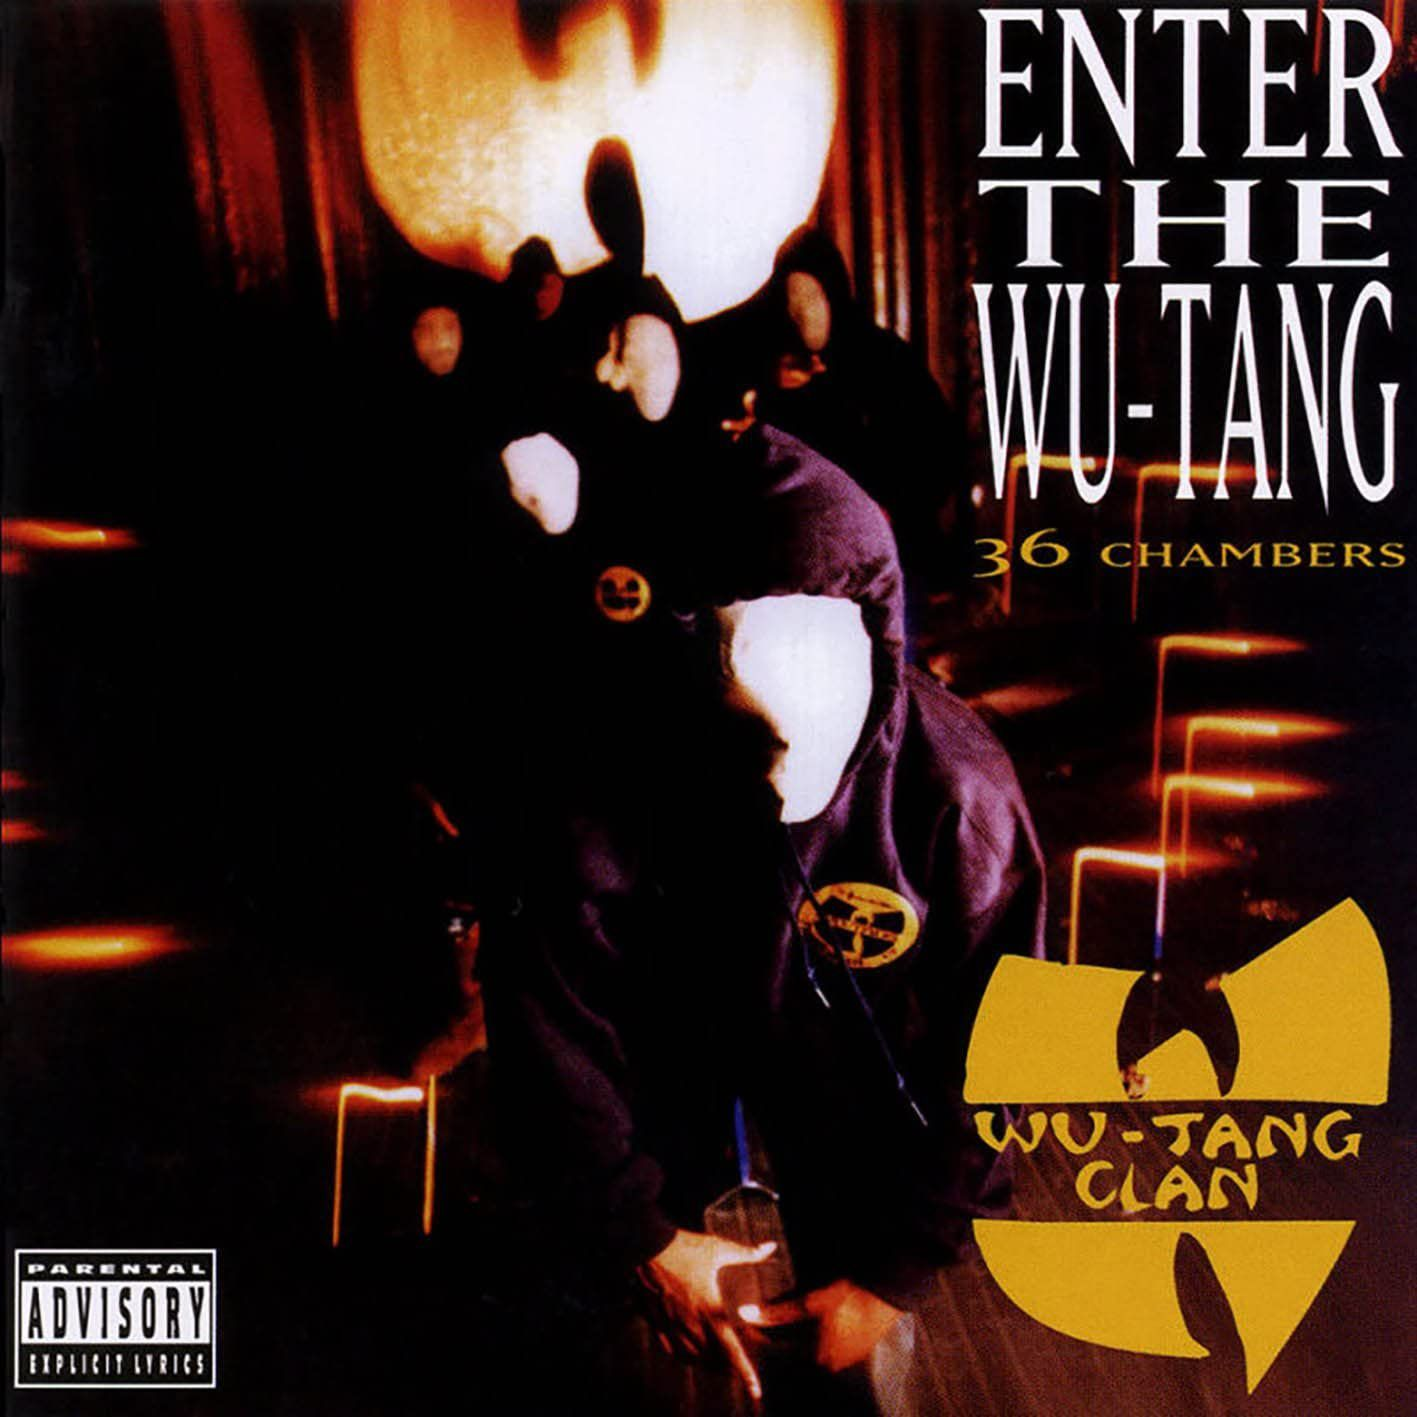 Wu-Tang Clan's 36 chambers album cover